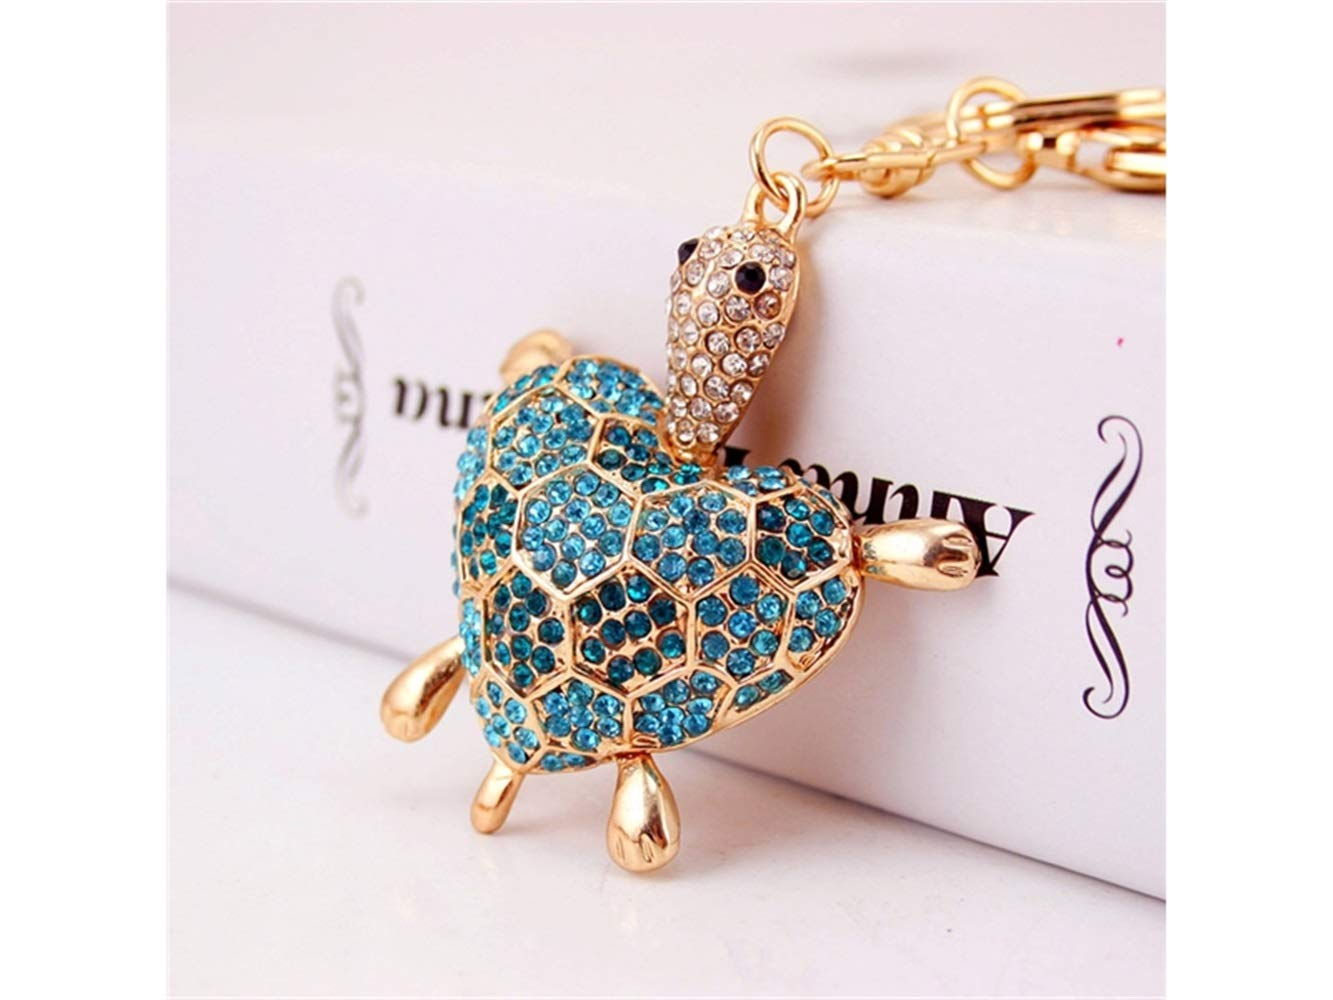 Car Keychain, Cute Diamond Love Back Shell Turtle Keychain Animal Key Trinket Car Bag Key Holder Decorations(Blue) for Gift